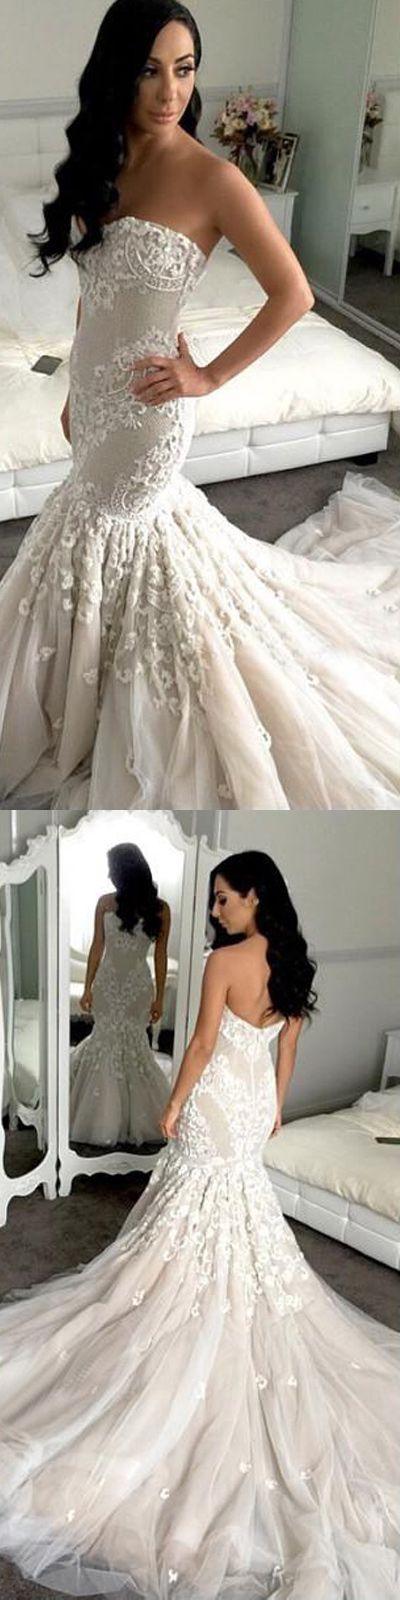 #mermaid wedding gown #long wedding dresses #mermaid bridal gown #elegant wedding dresses